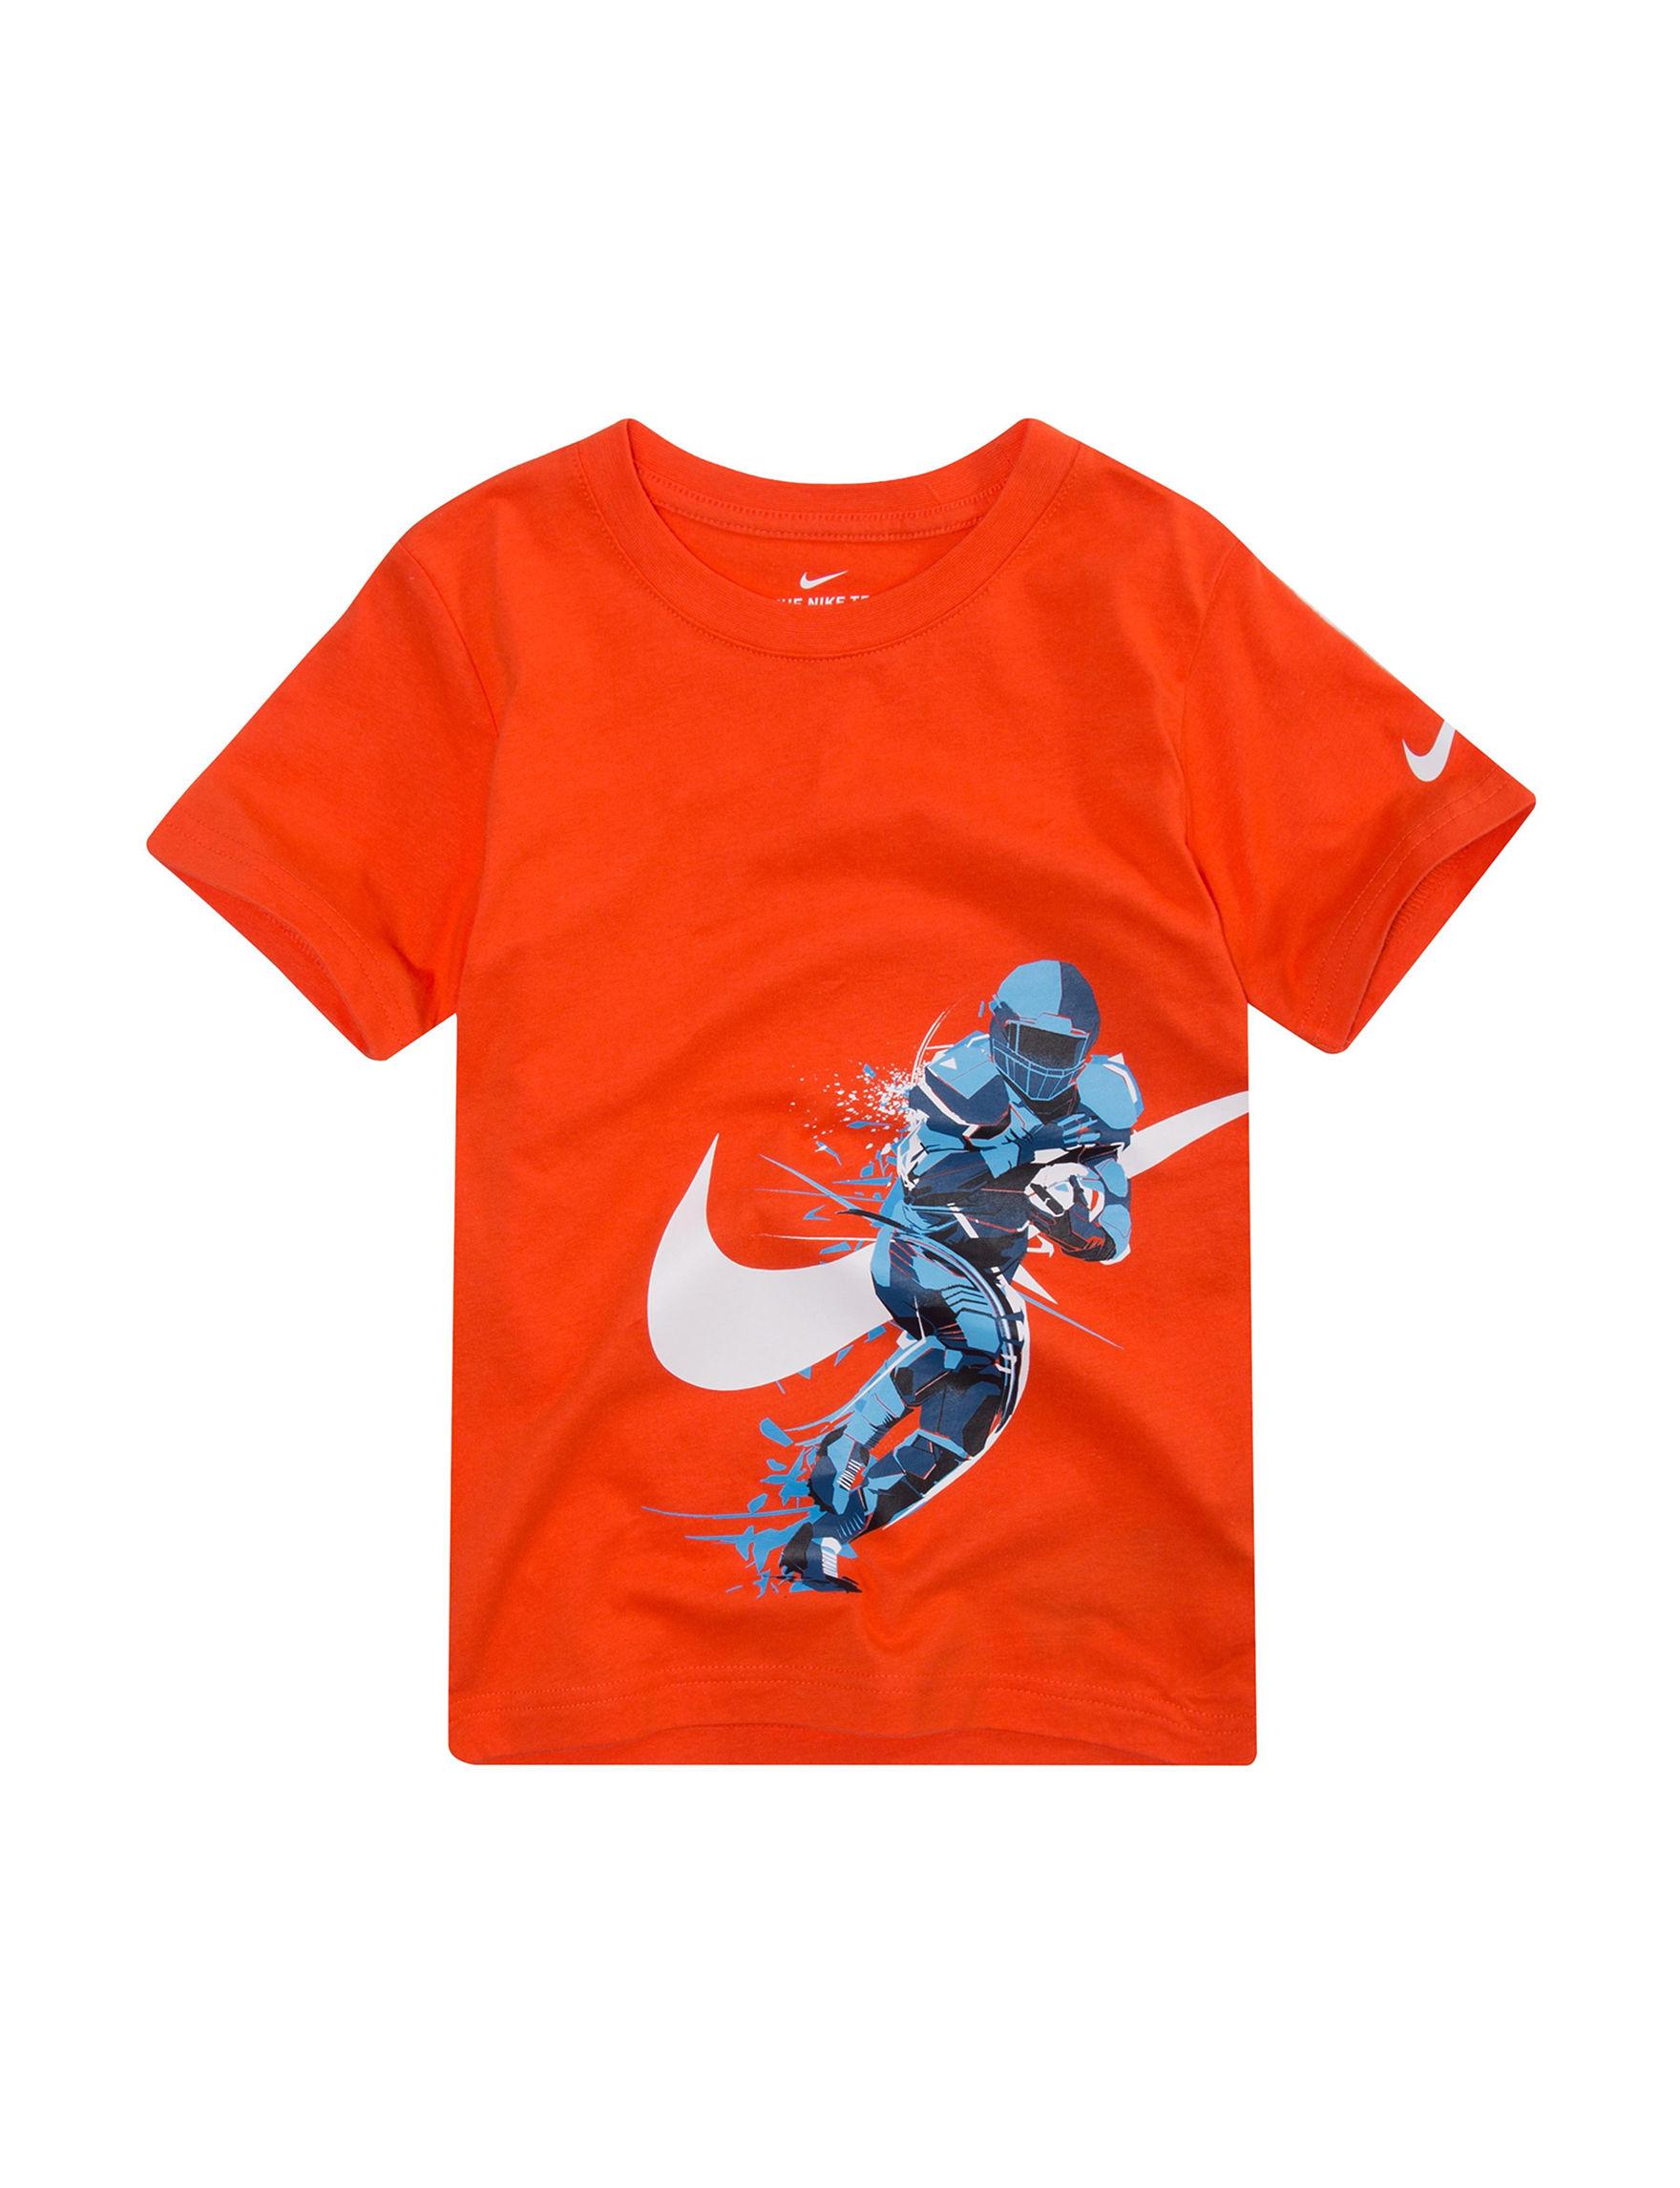 Nike Bright Orange Tees & Tanks